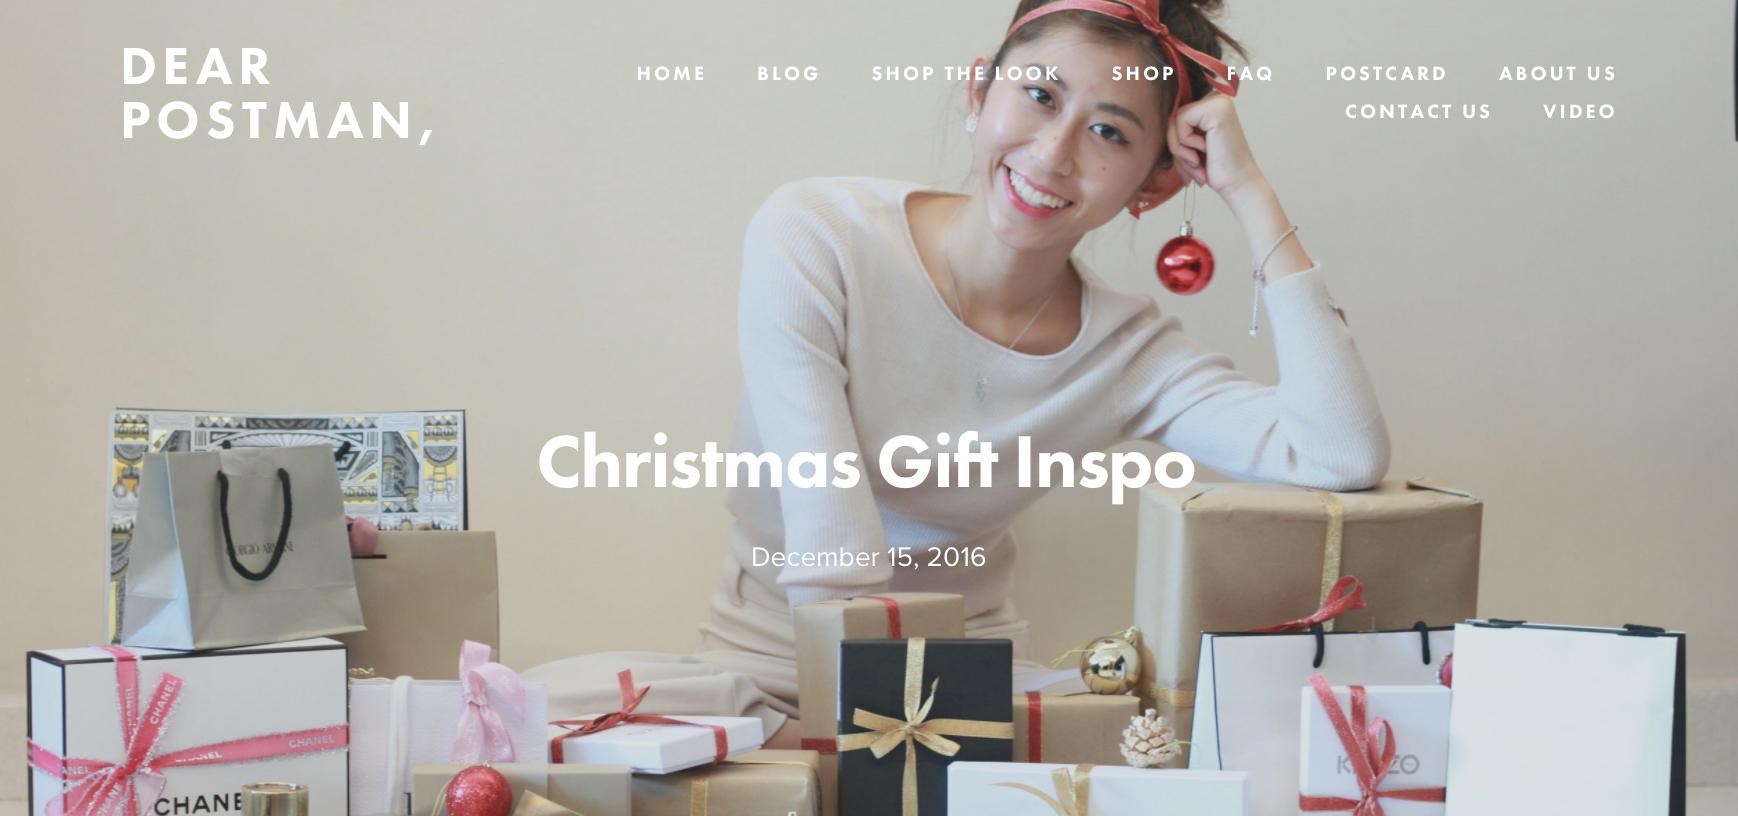 Christmas Gift Inspo